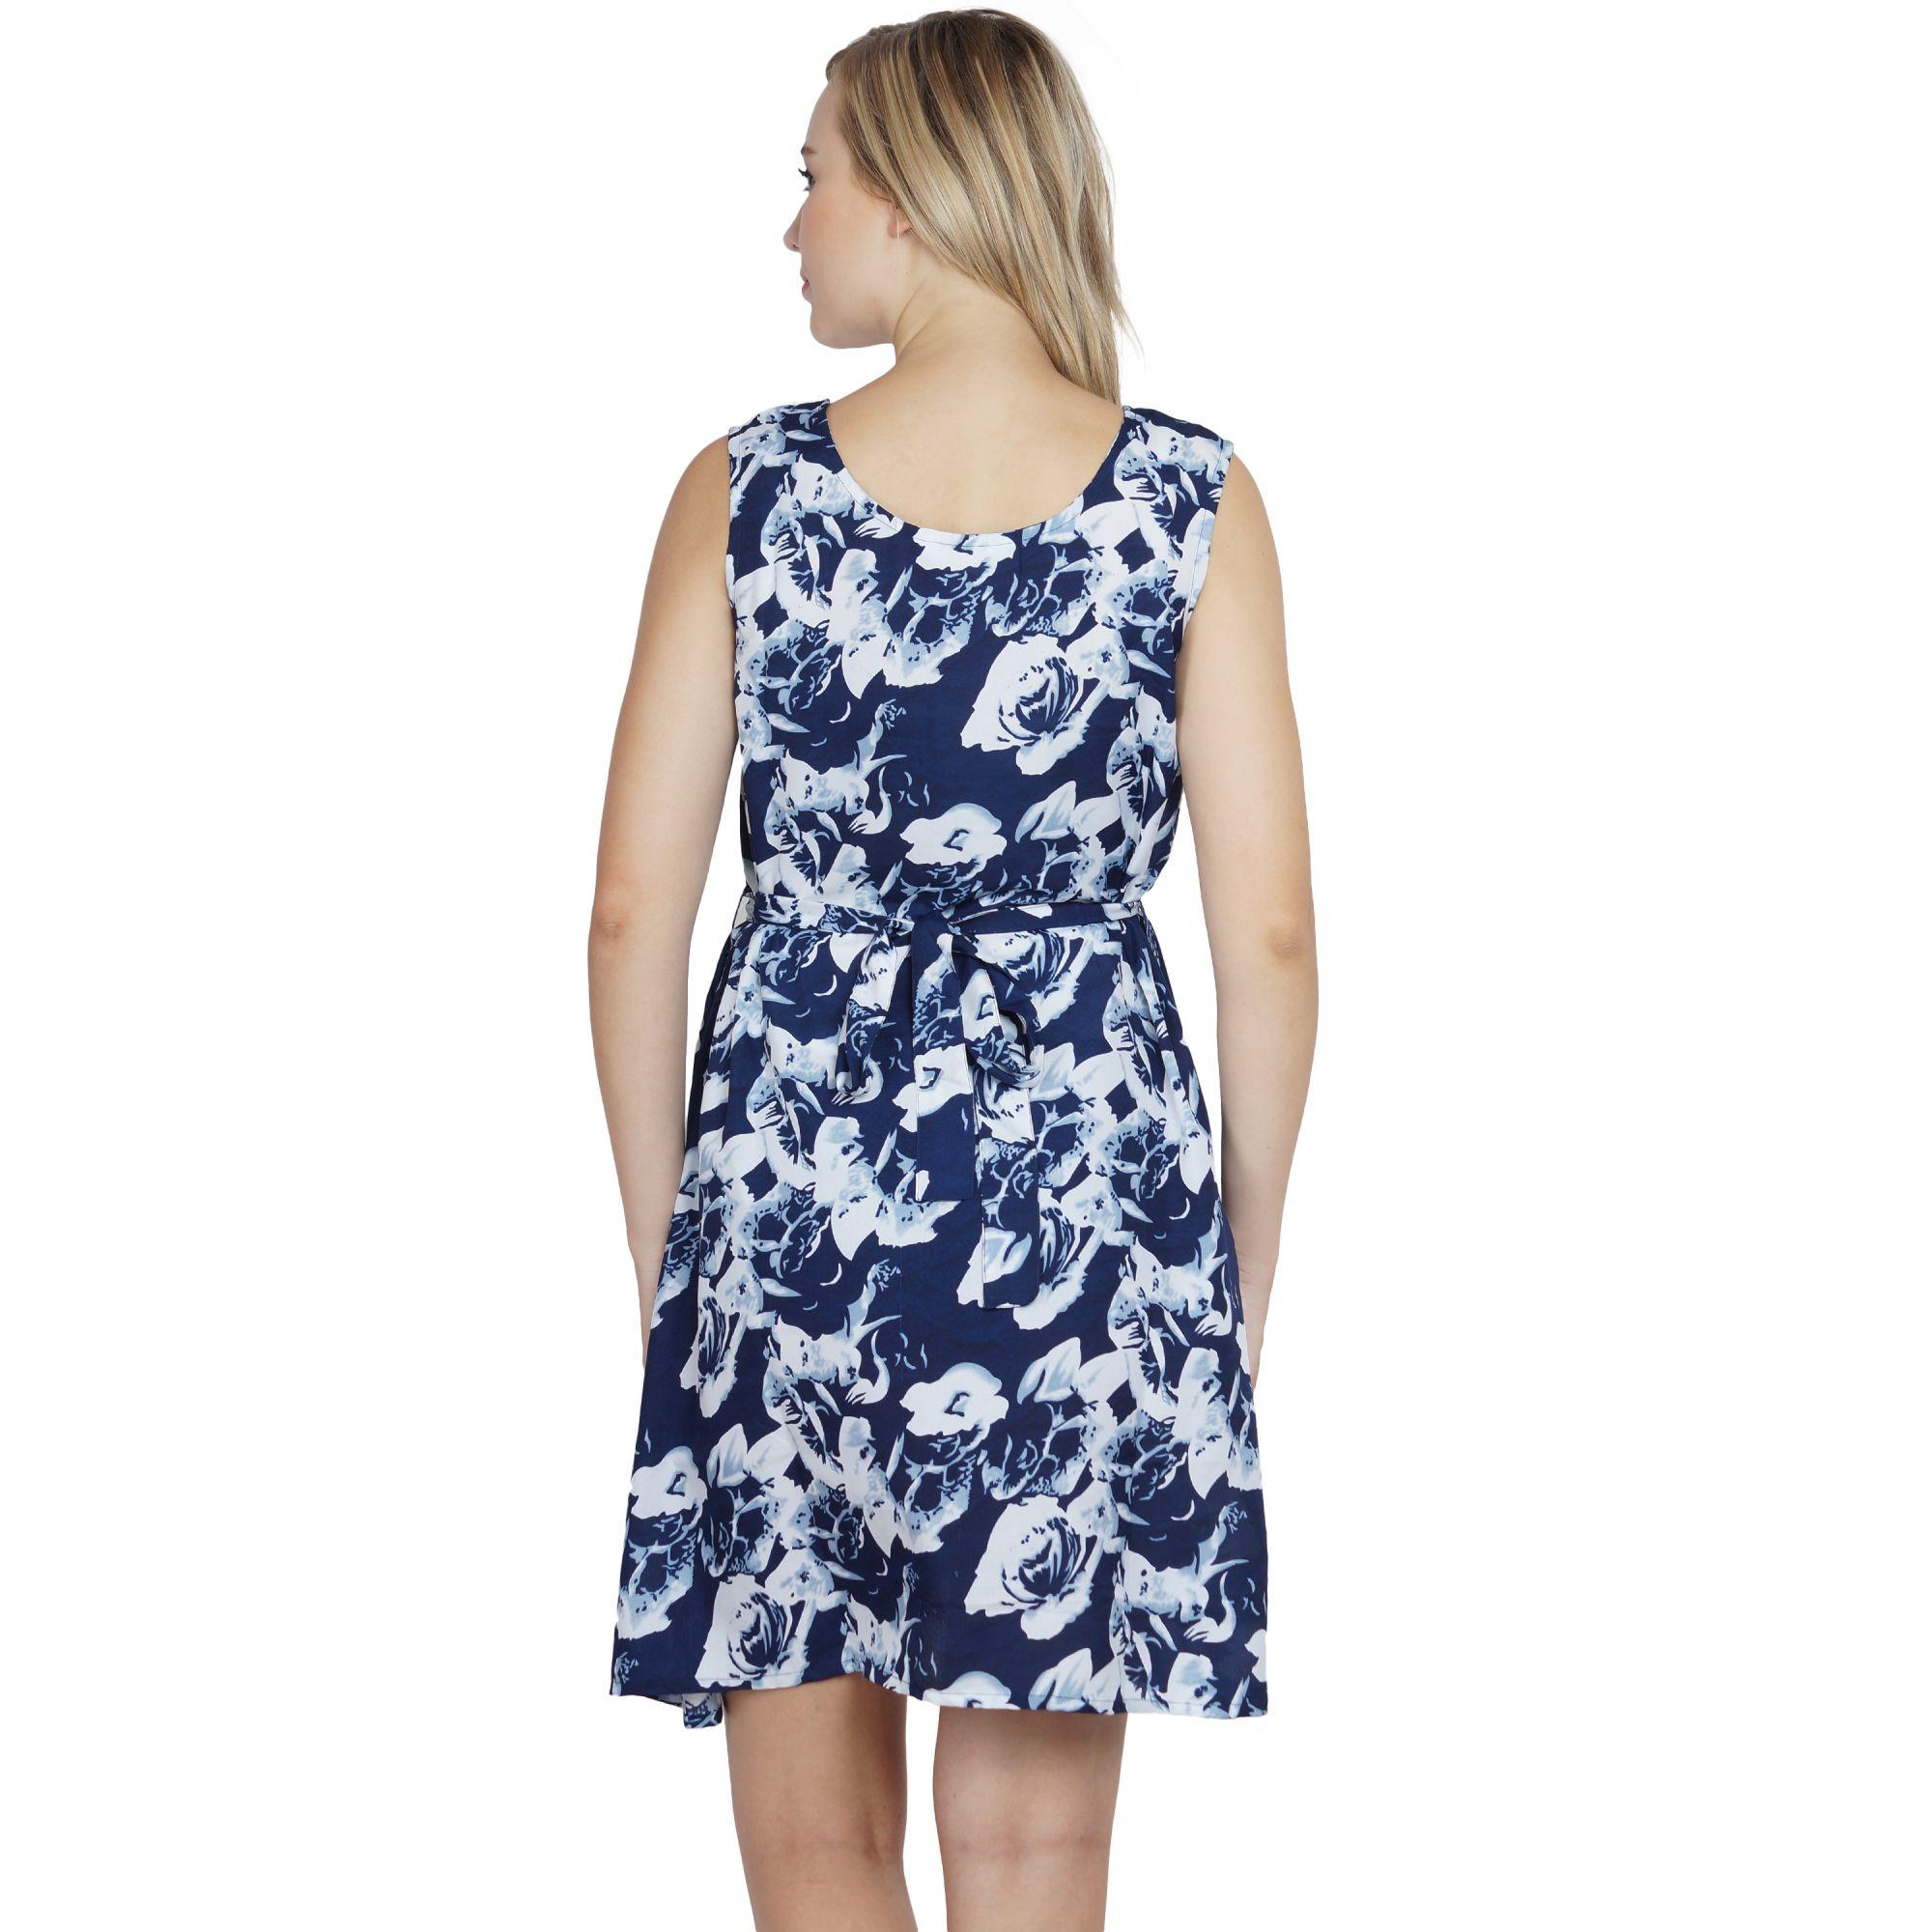 A-Line Floral Print Midi Dress in Blue Print